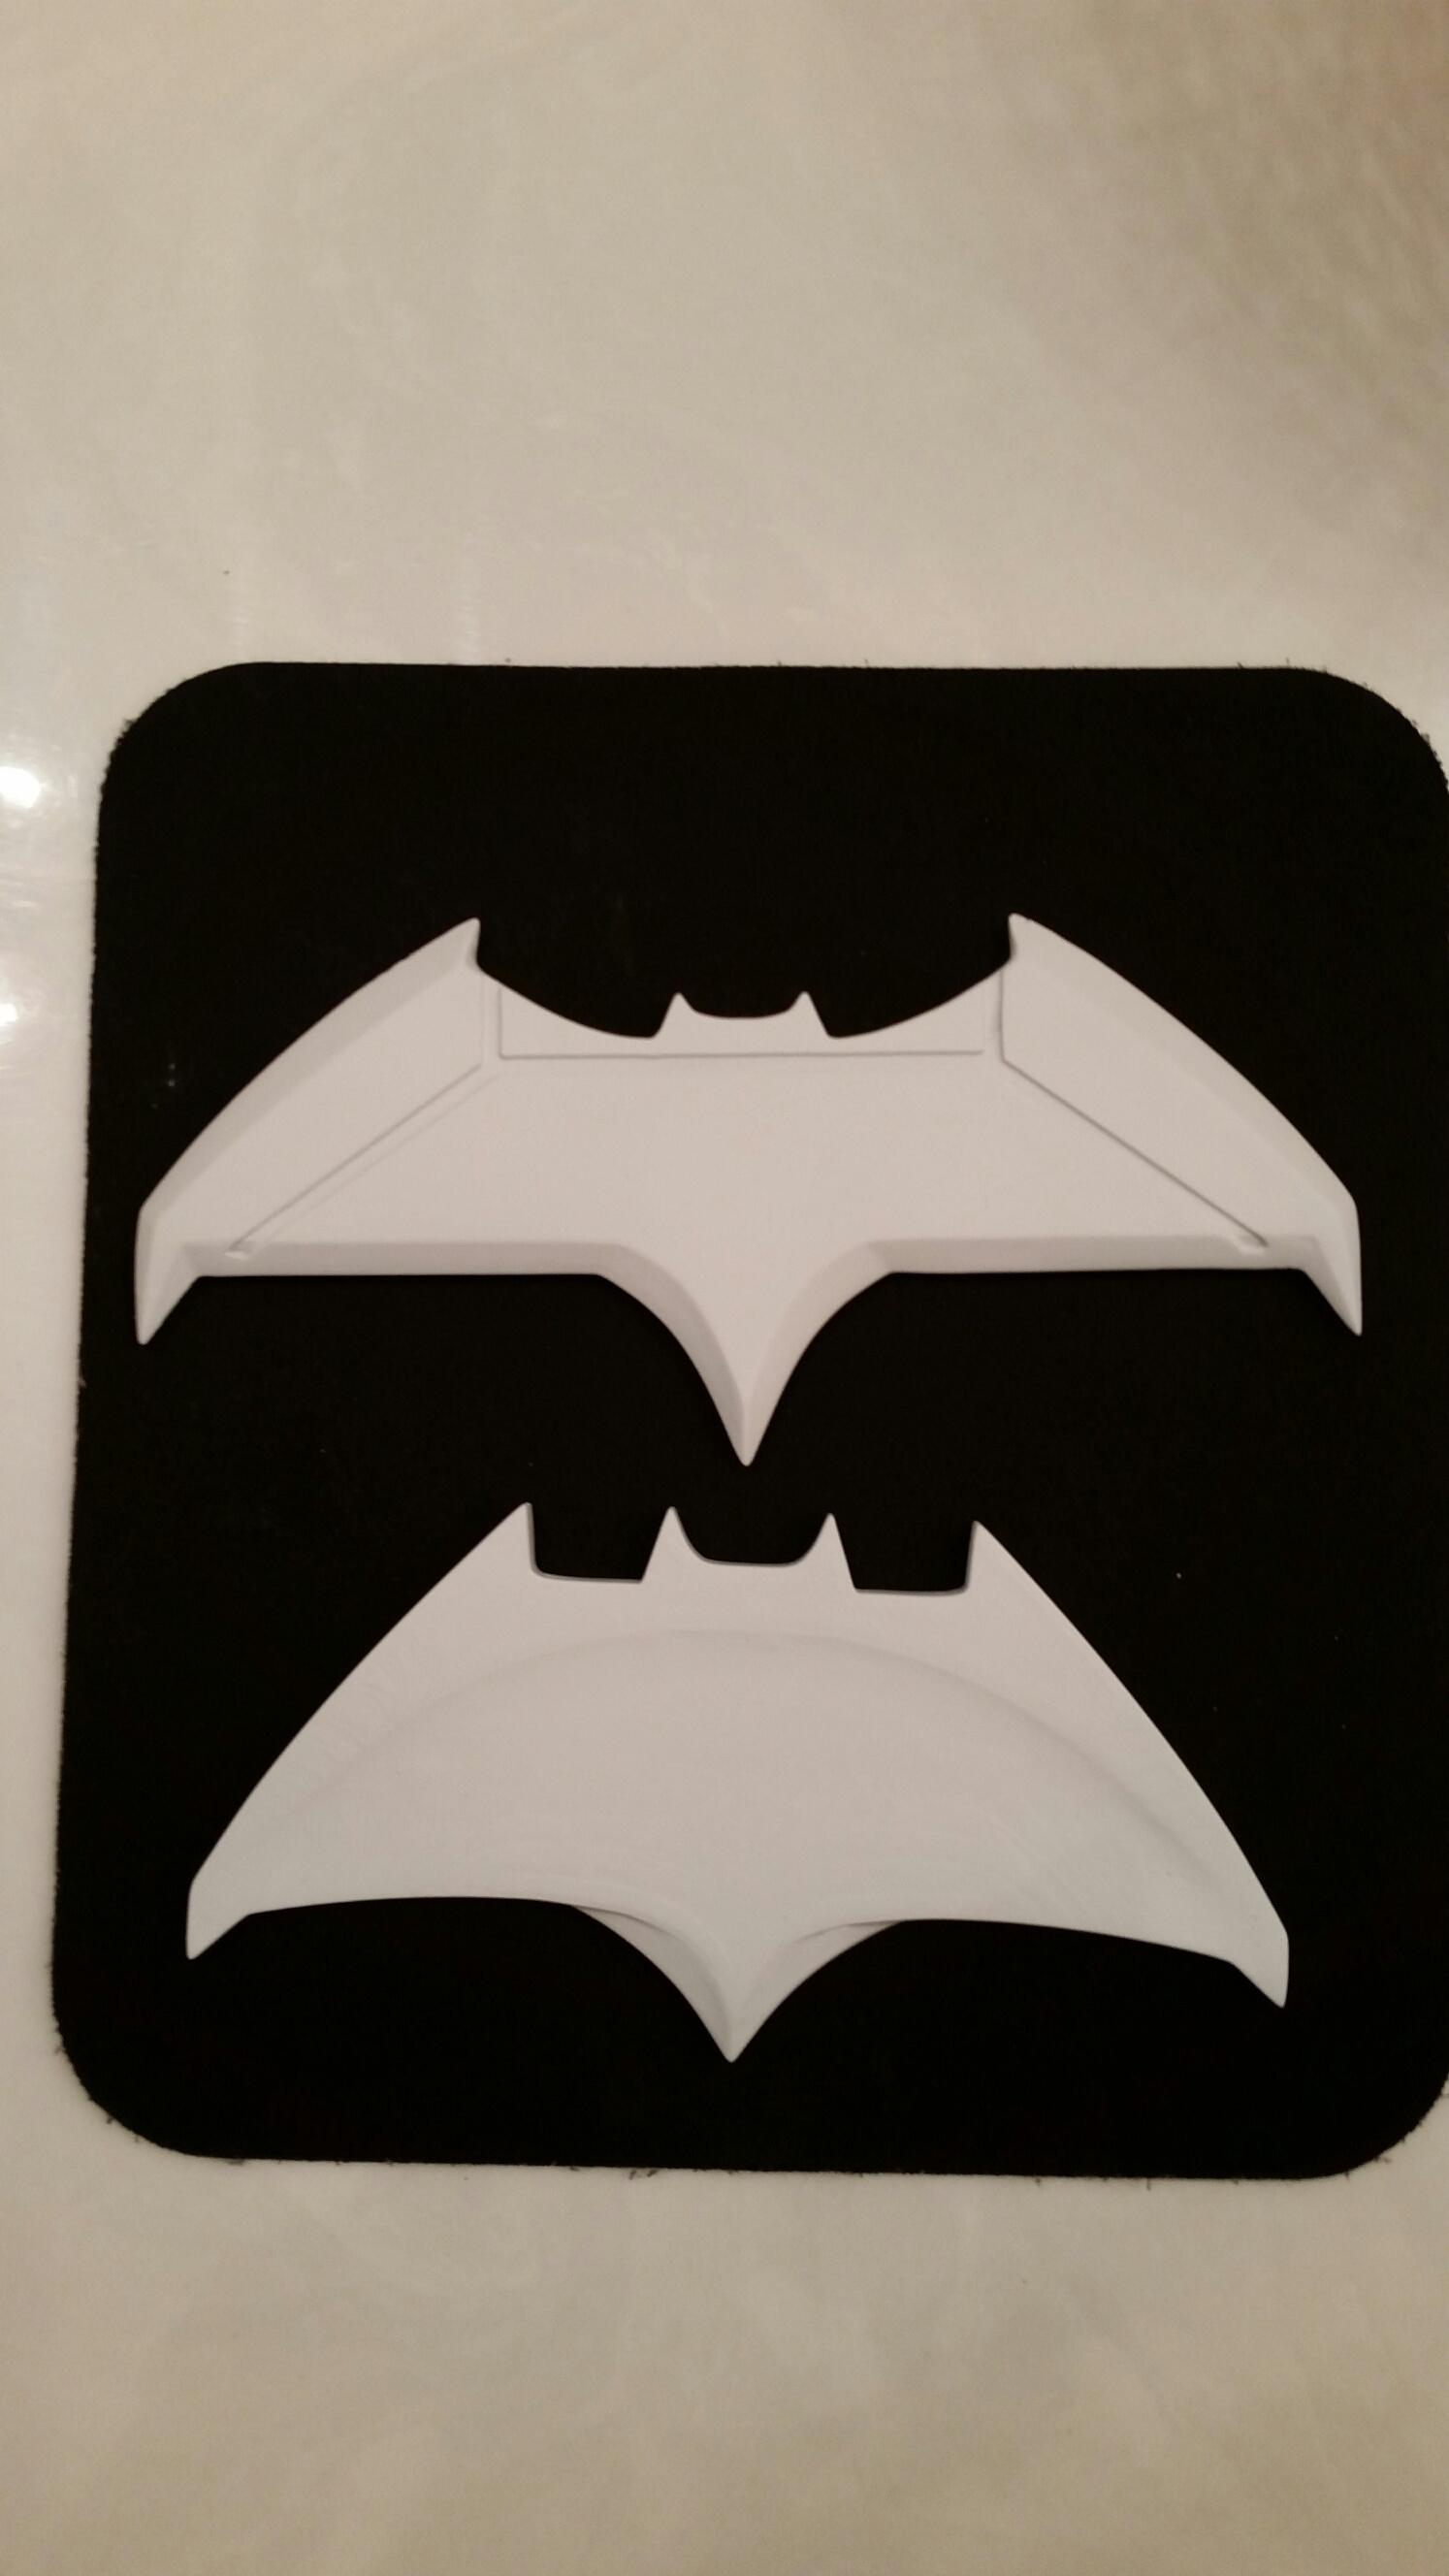 batarang_ready_4molding.jpg